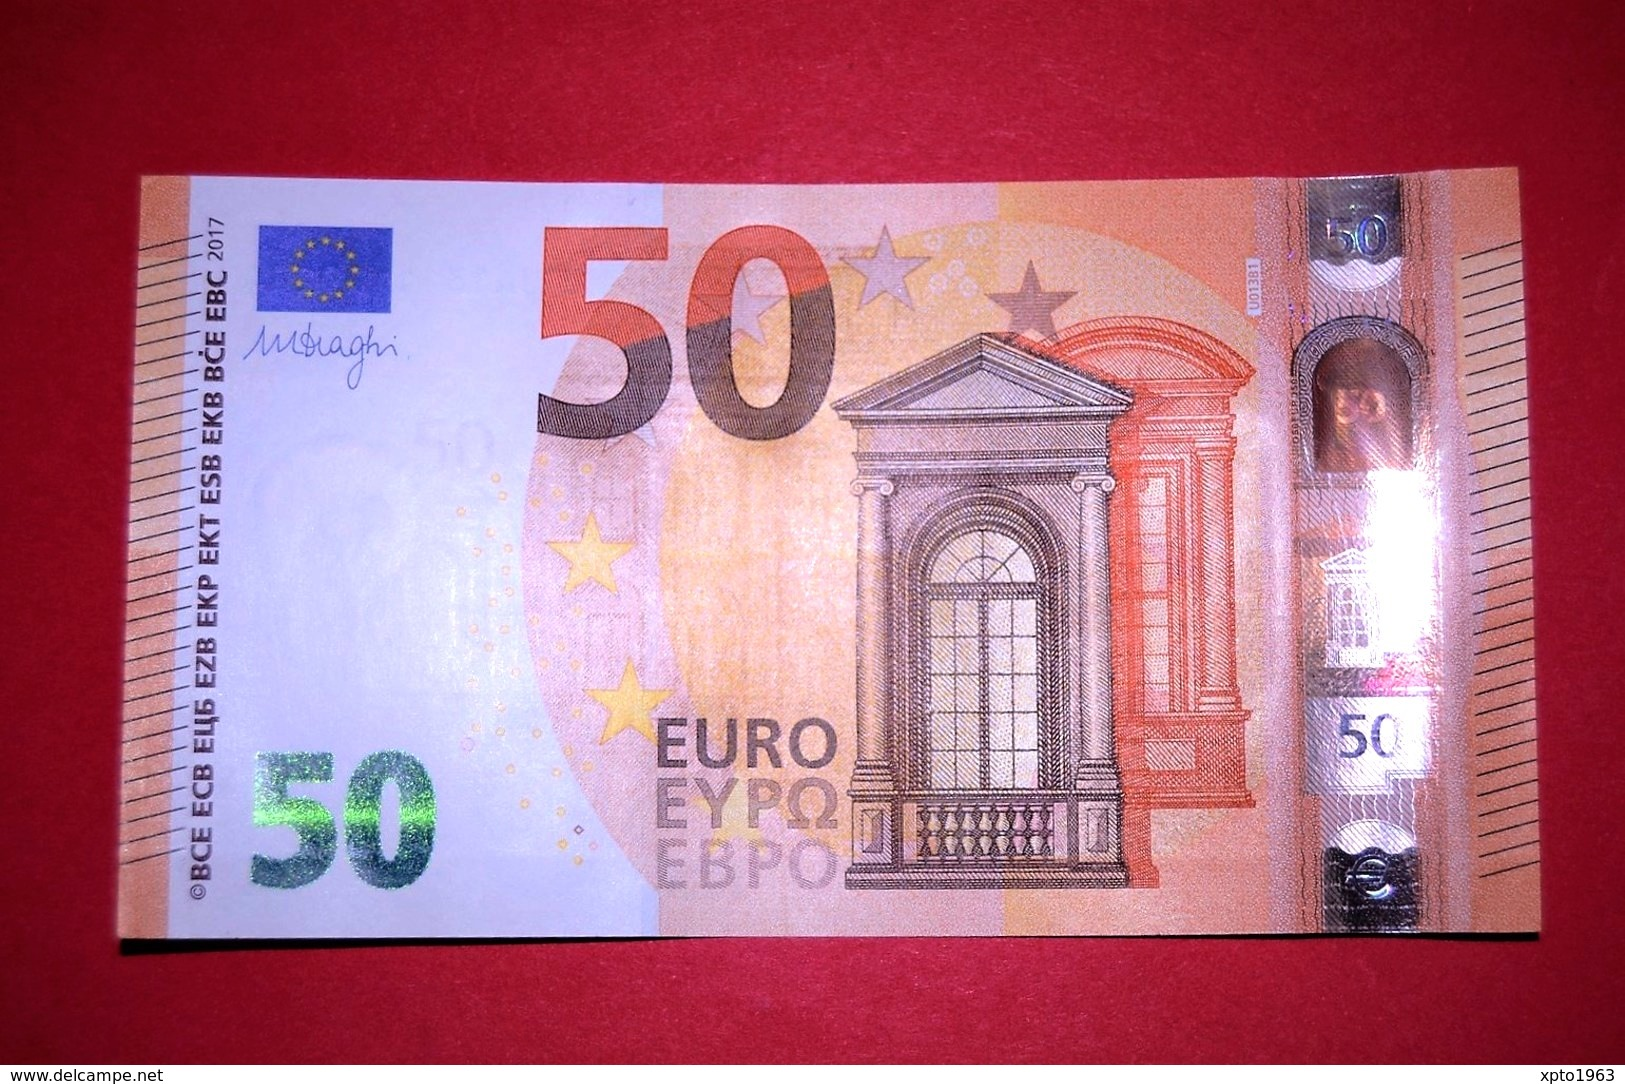 50 EURO FRANCE - U013B1 - UA1311199284 - UNC DRAGHI - 50 Euro